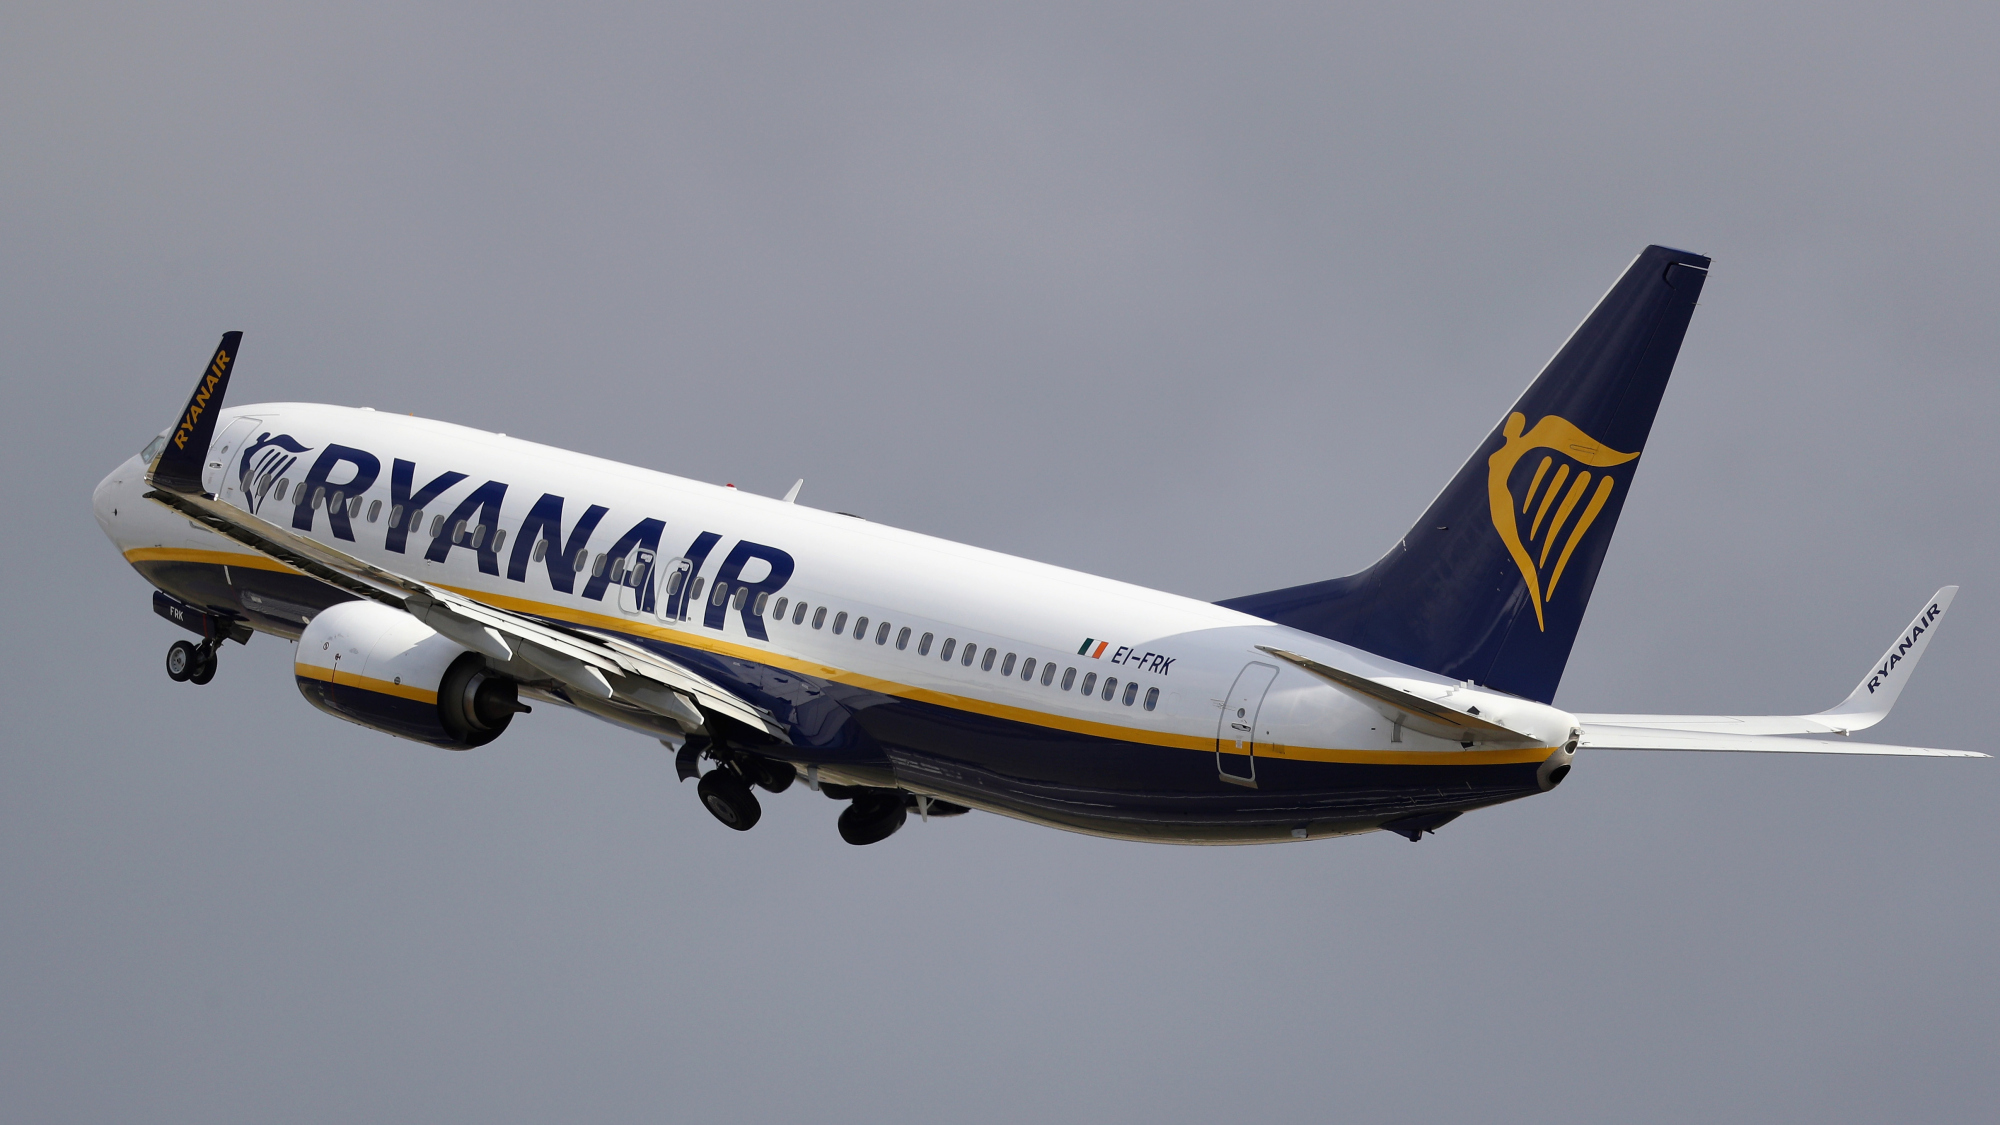 Iron Maiden Airplane Merkel Hollande The Best And Latest Aircraft 2018